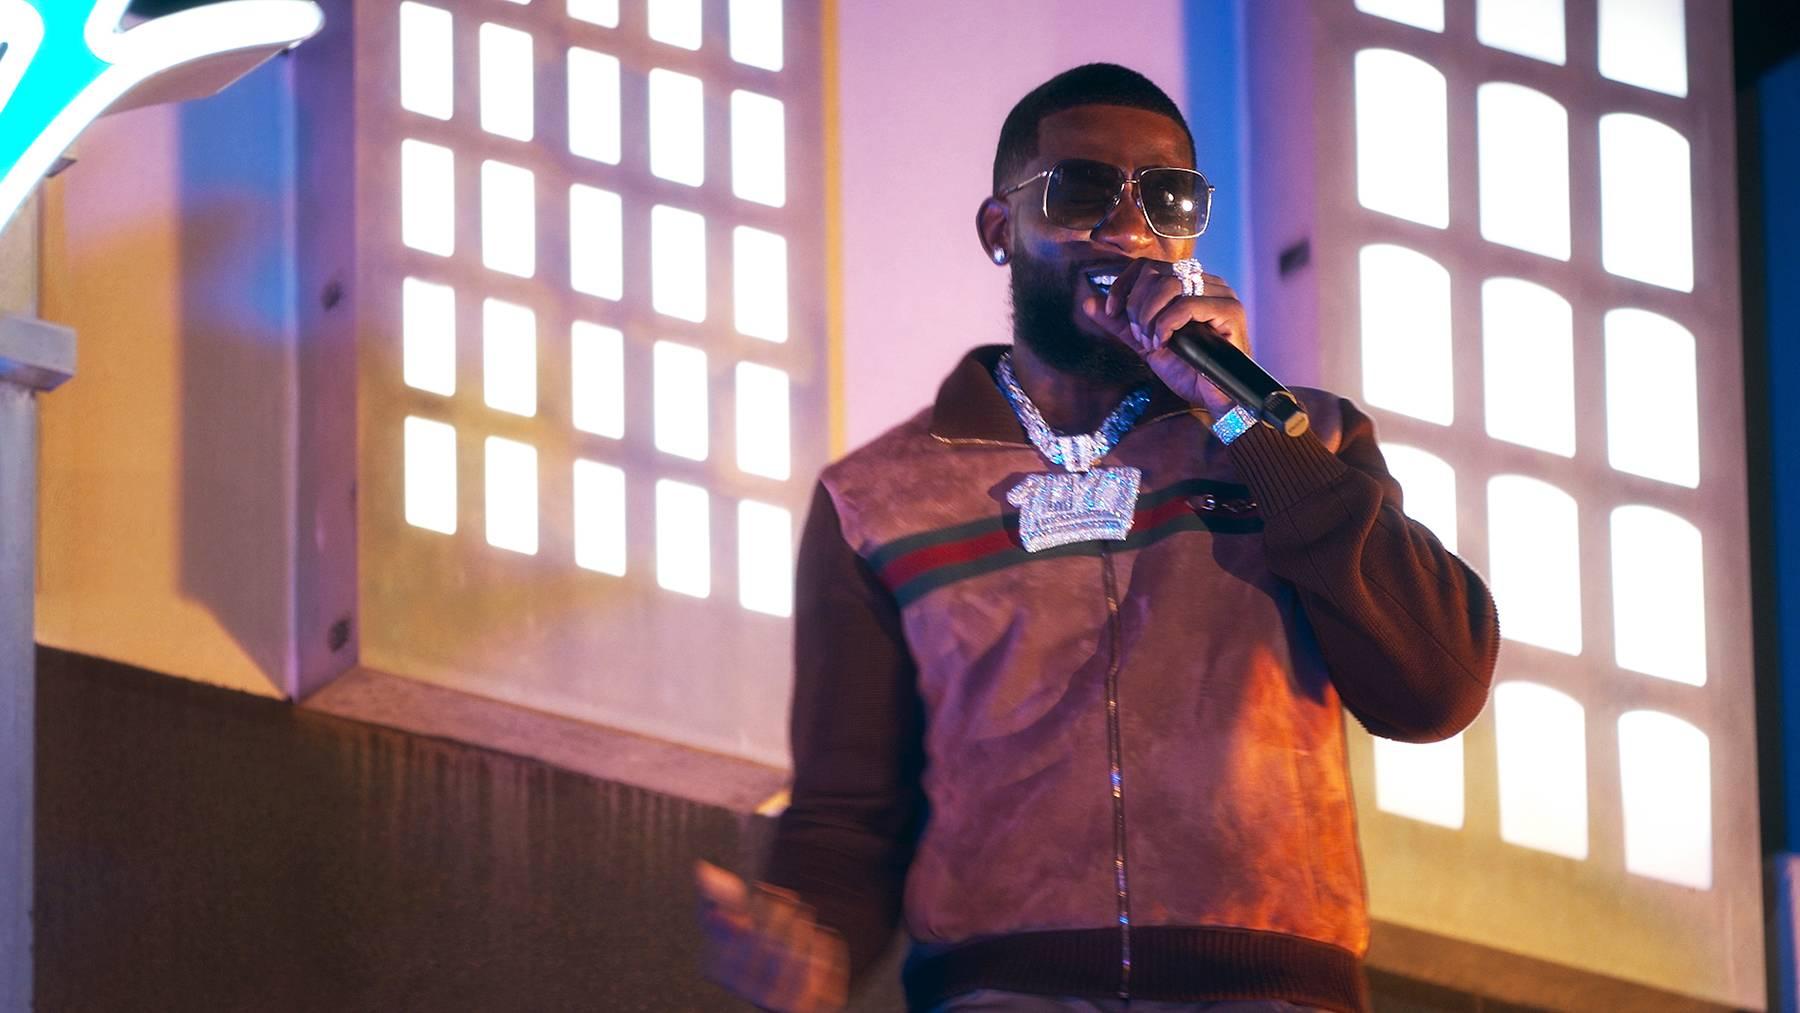 Hip Hop Awards 2020 | Show Highlights Gallery Gucci Mane | 1920x1080